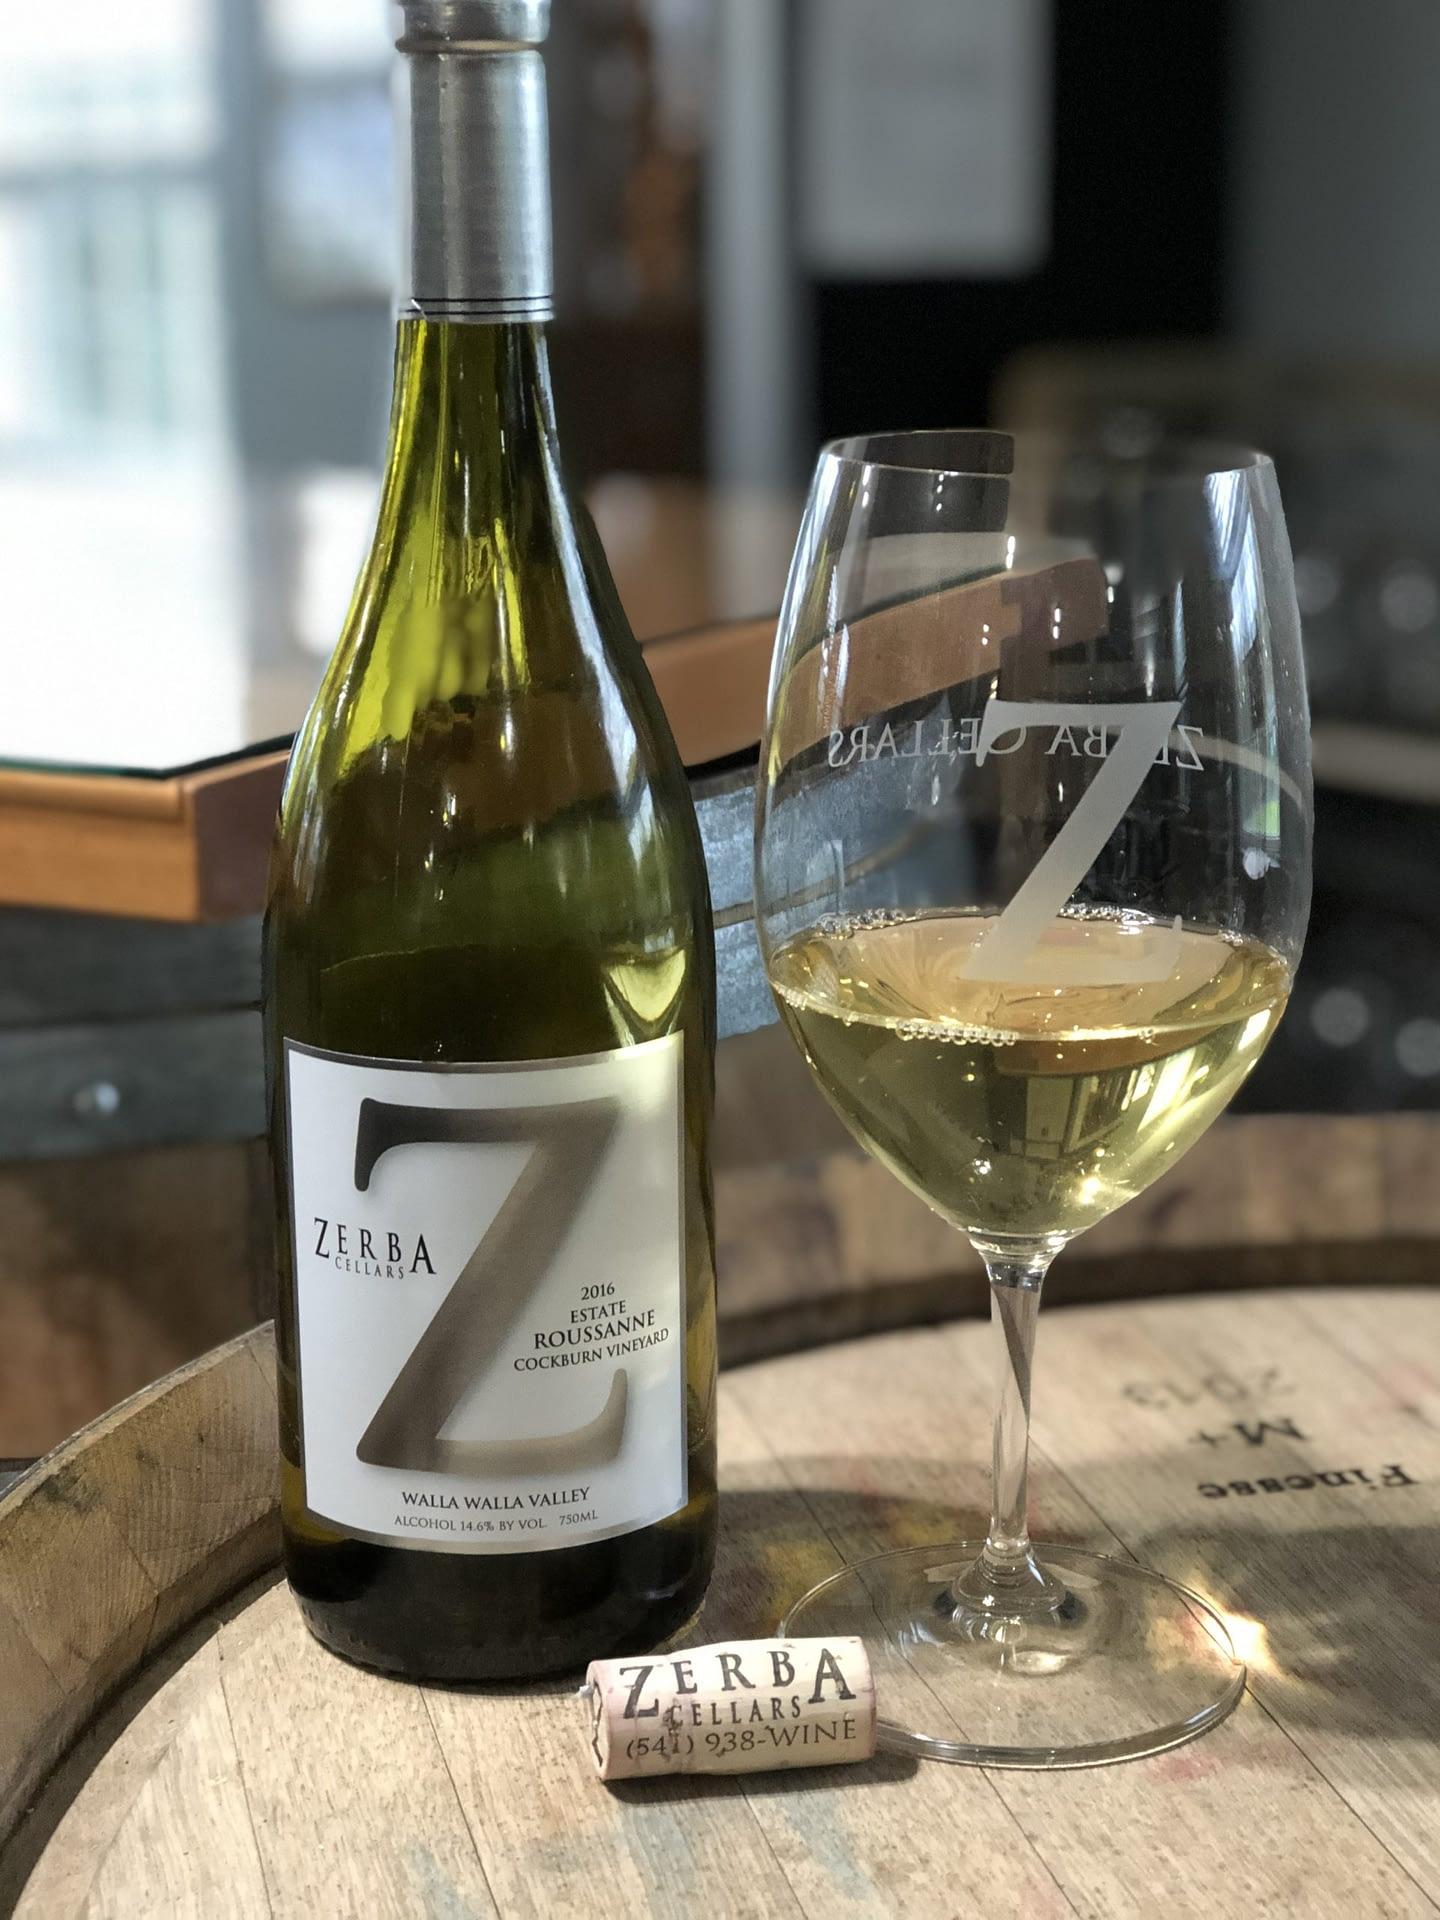 Zerba Wine Cellars white wine bottle and glass